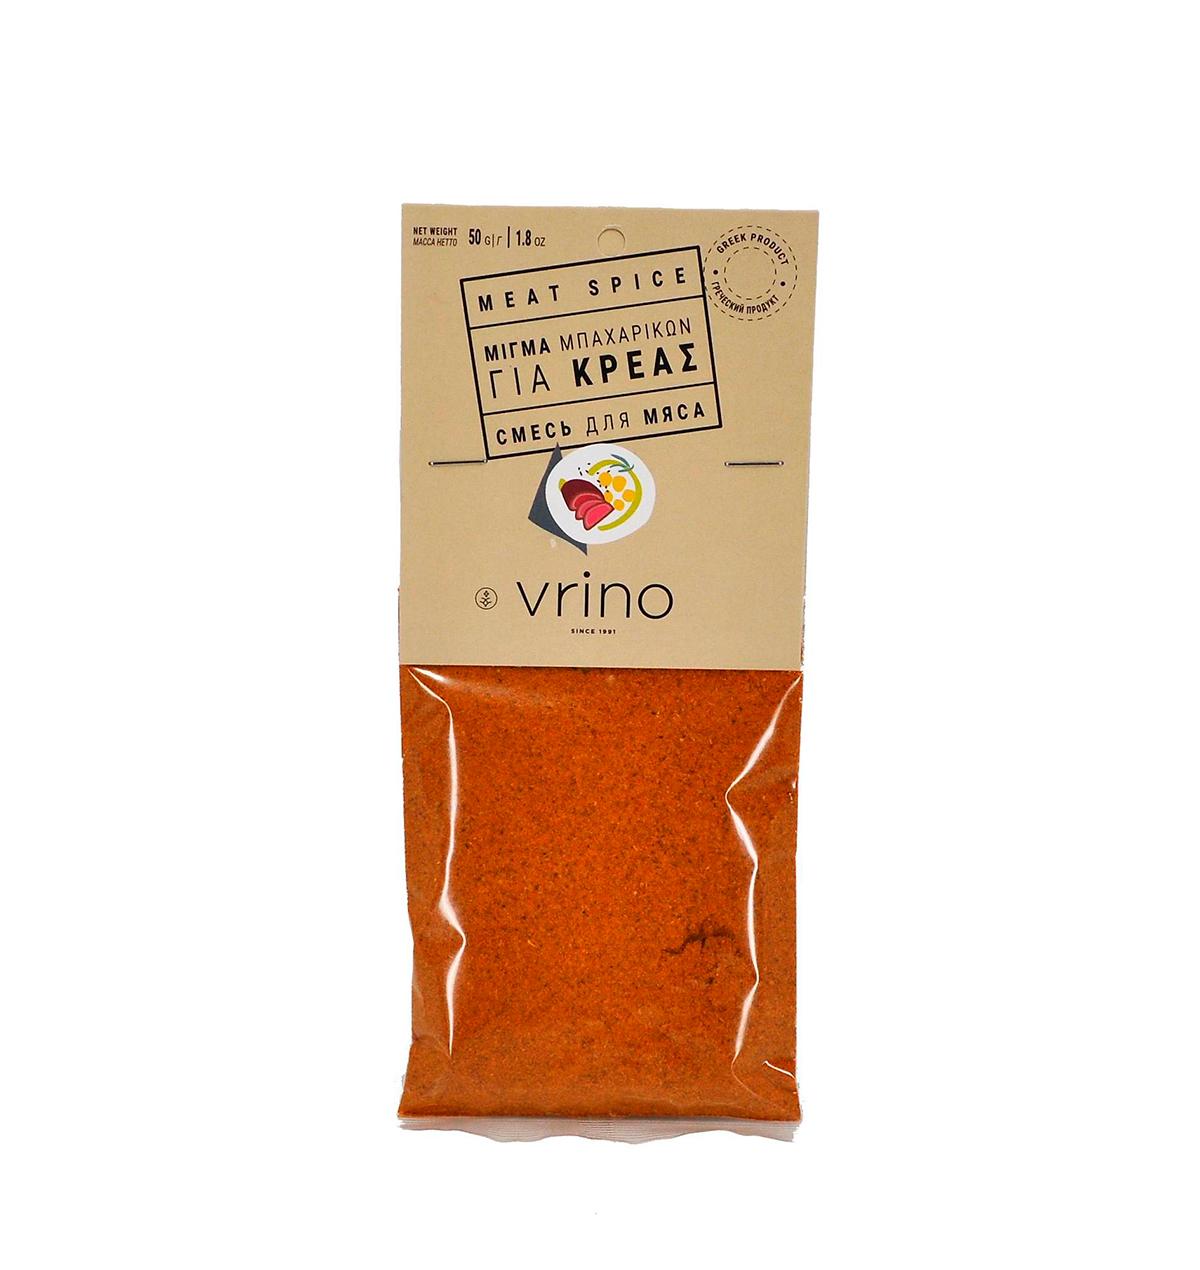 Приправа для мяса VRINO 50 г